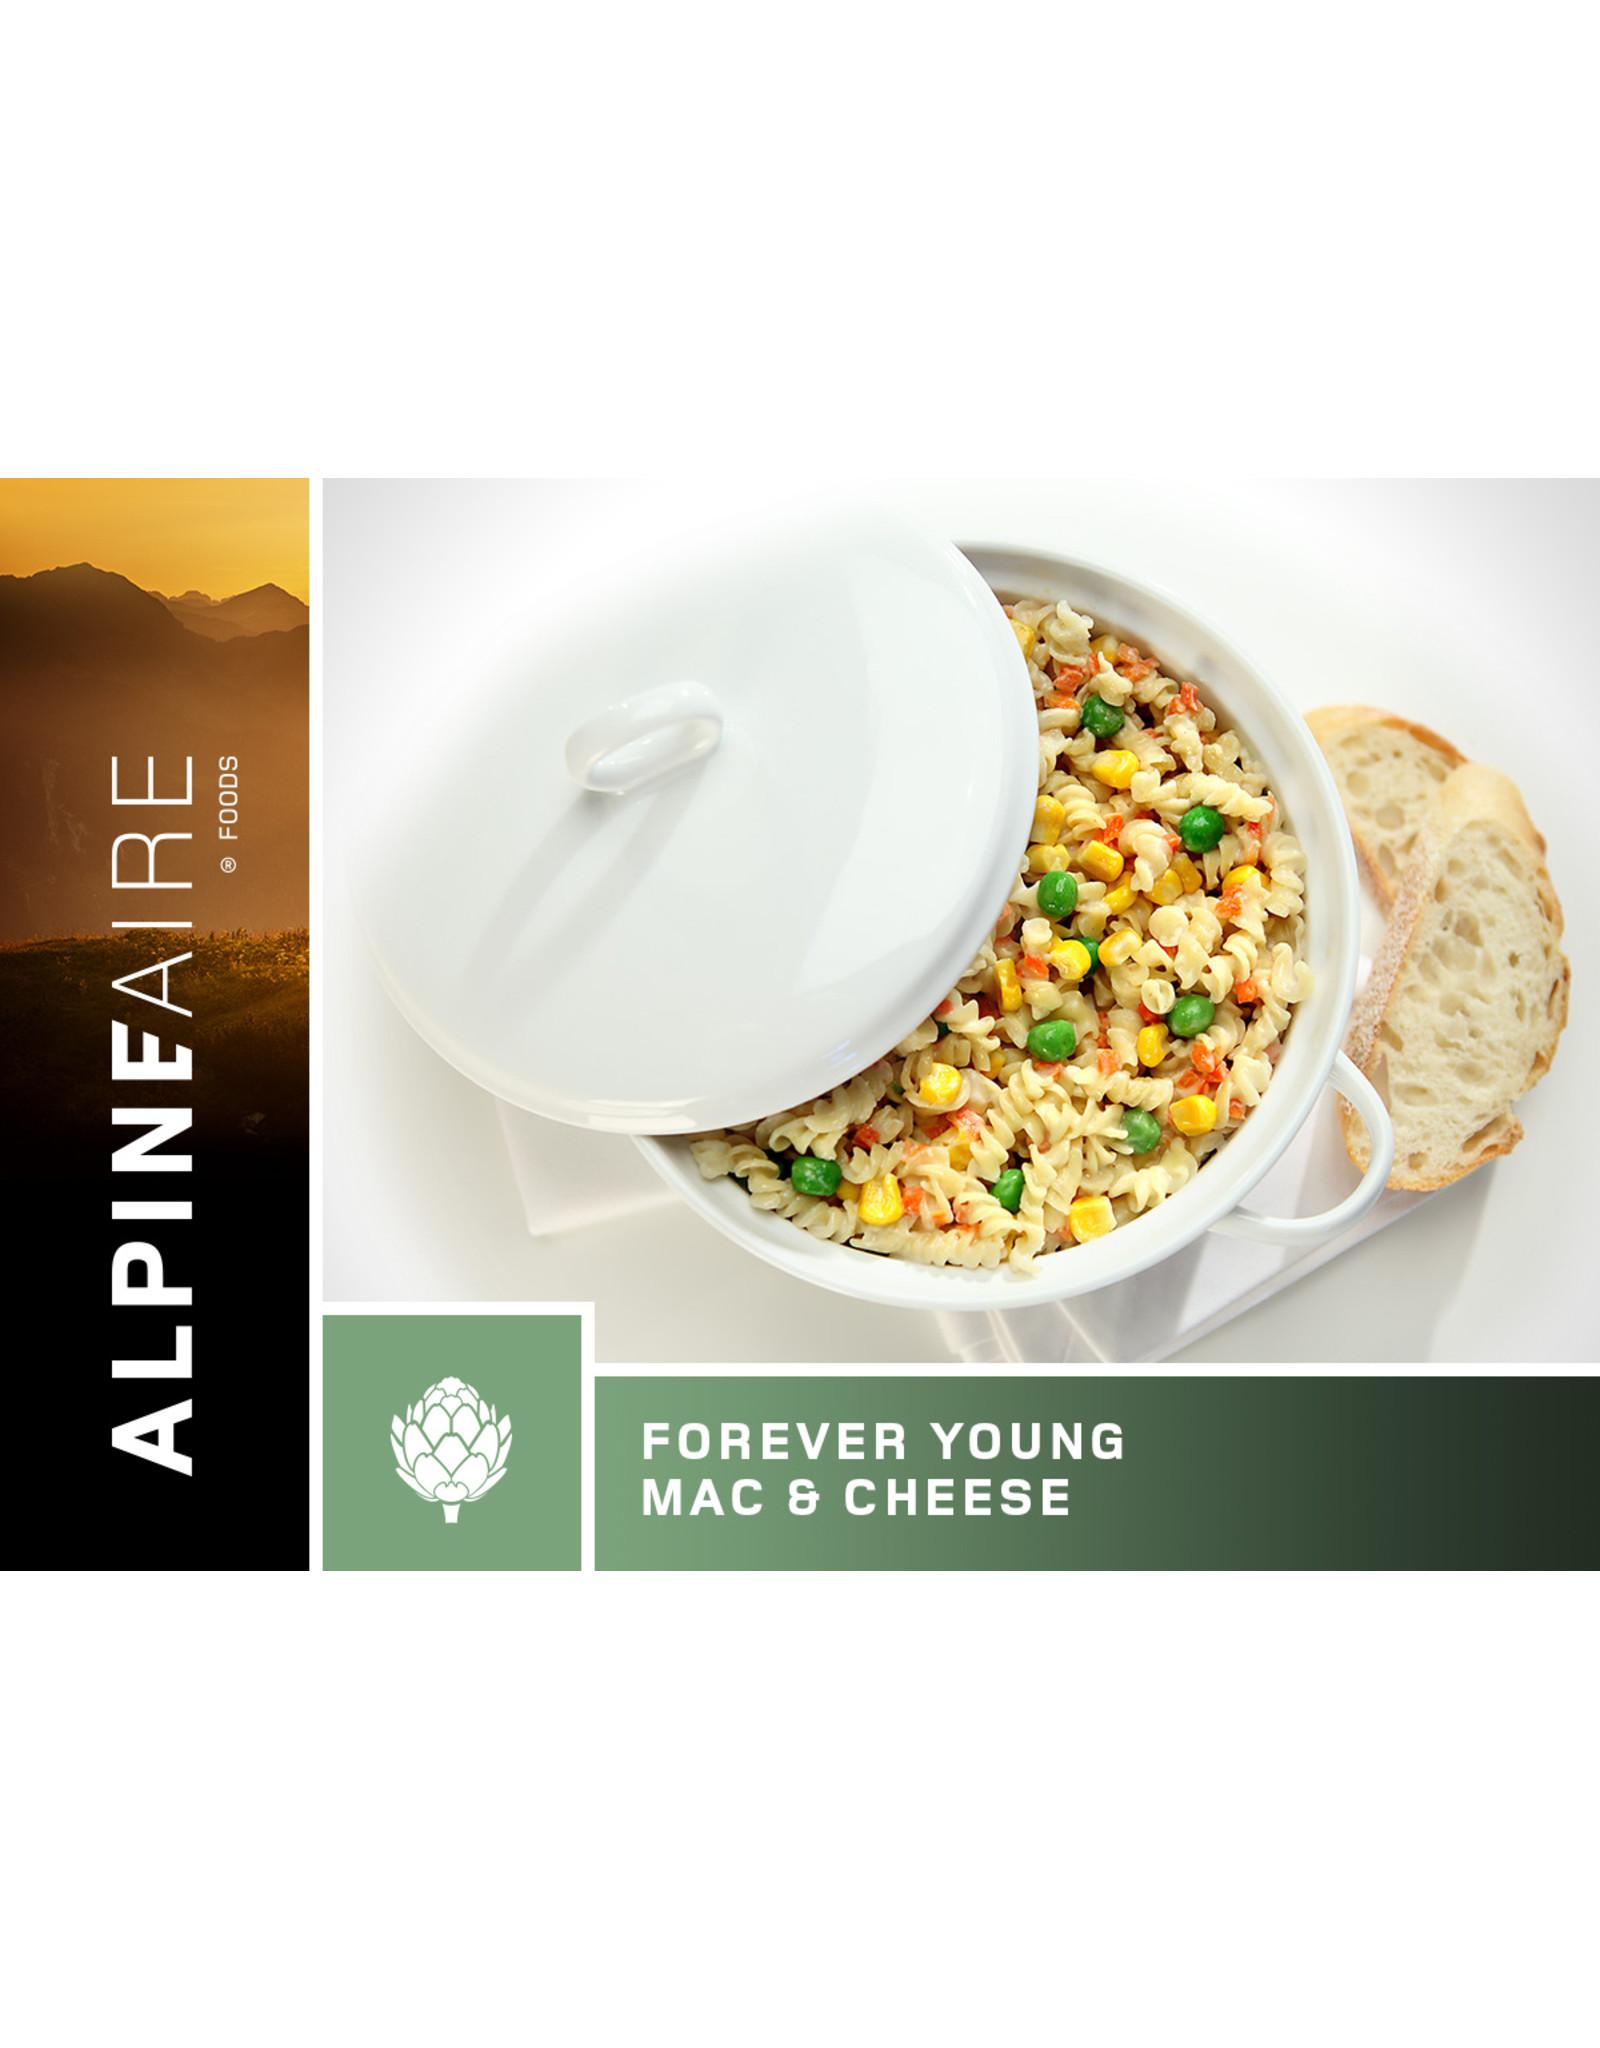 KATADYN ALPINE AIRE FREEZE DRIED FOOD